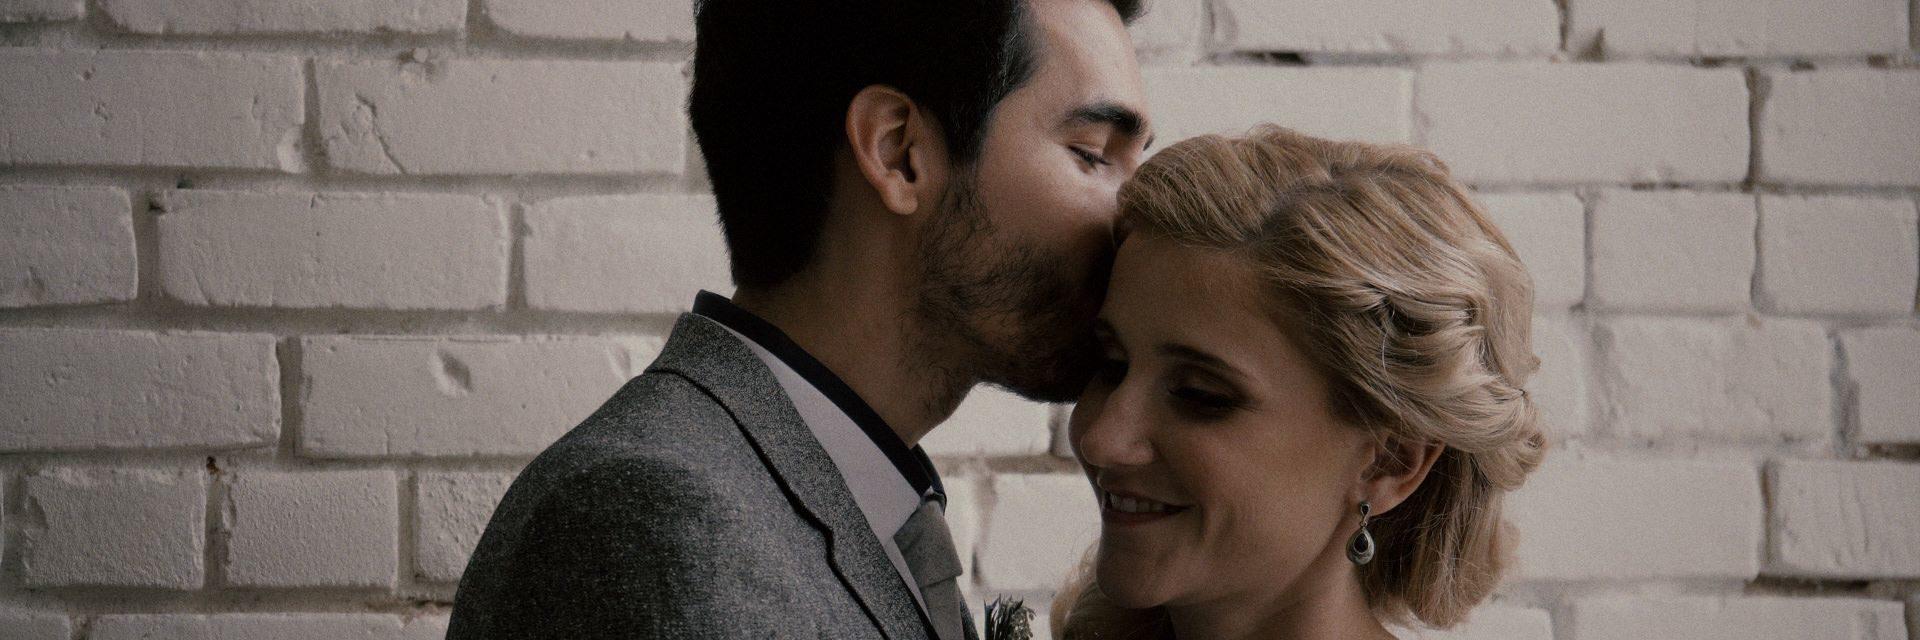 Sicily-wedding-videographer-cinemate-films-03